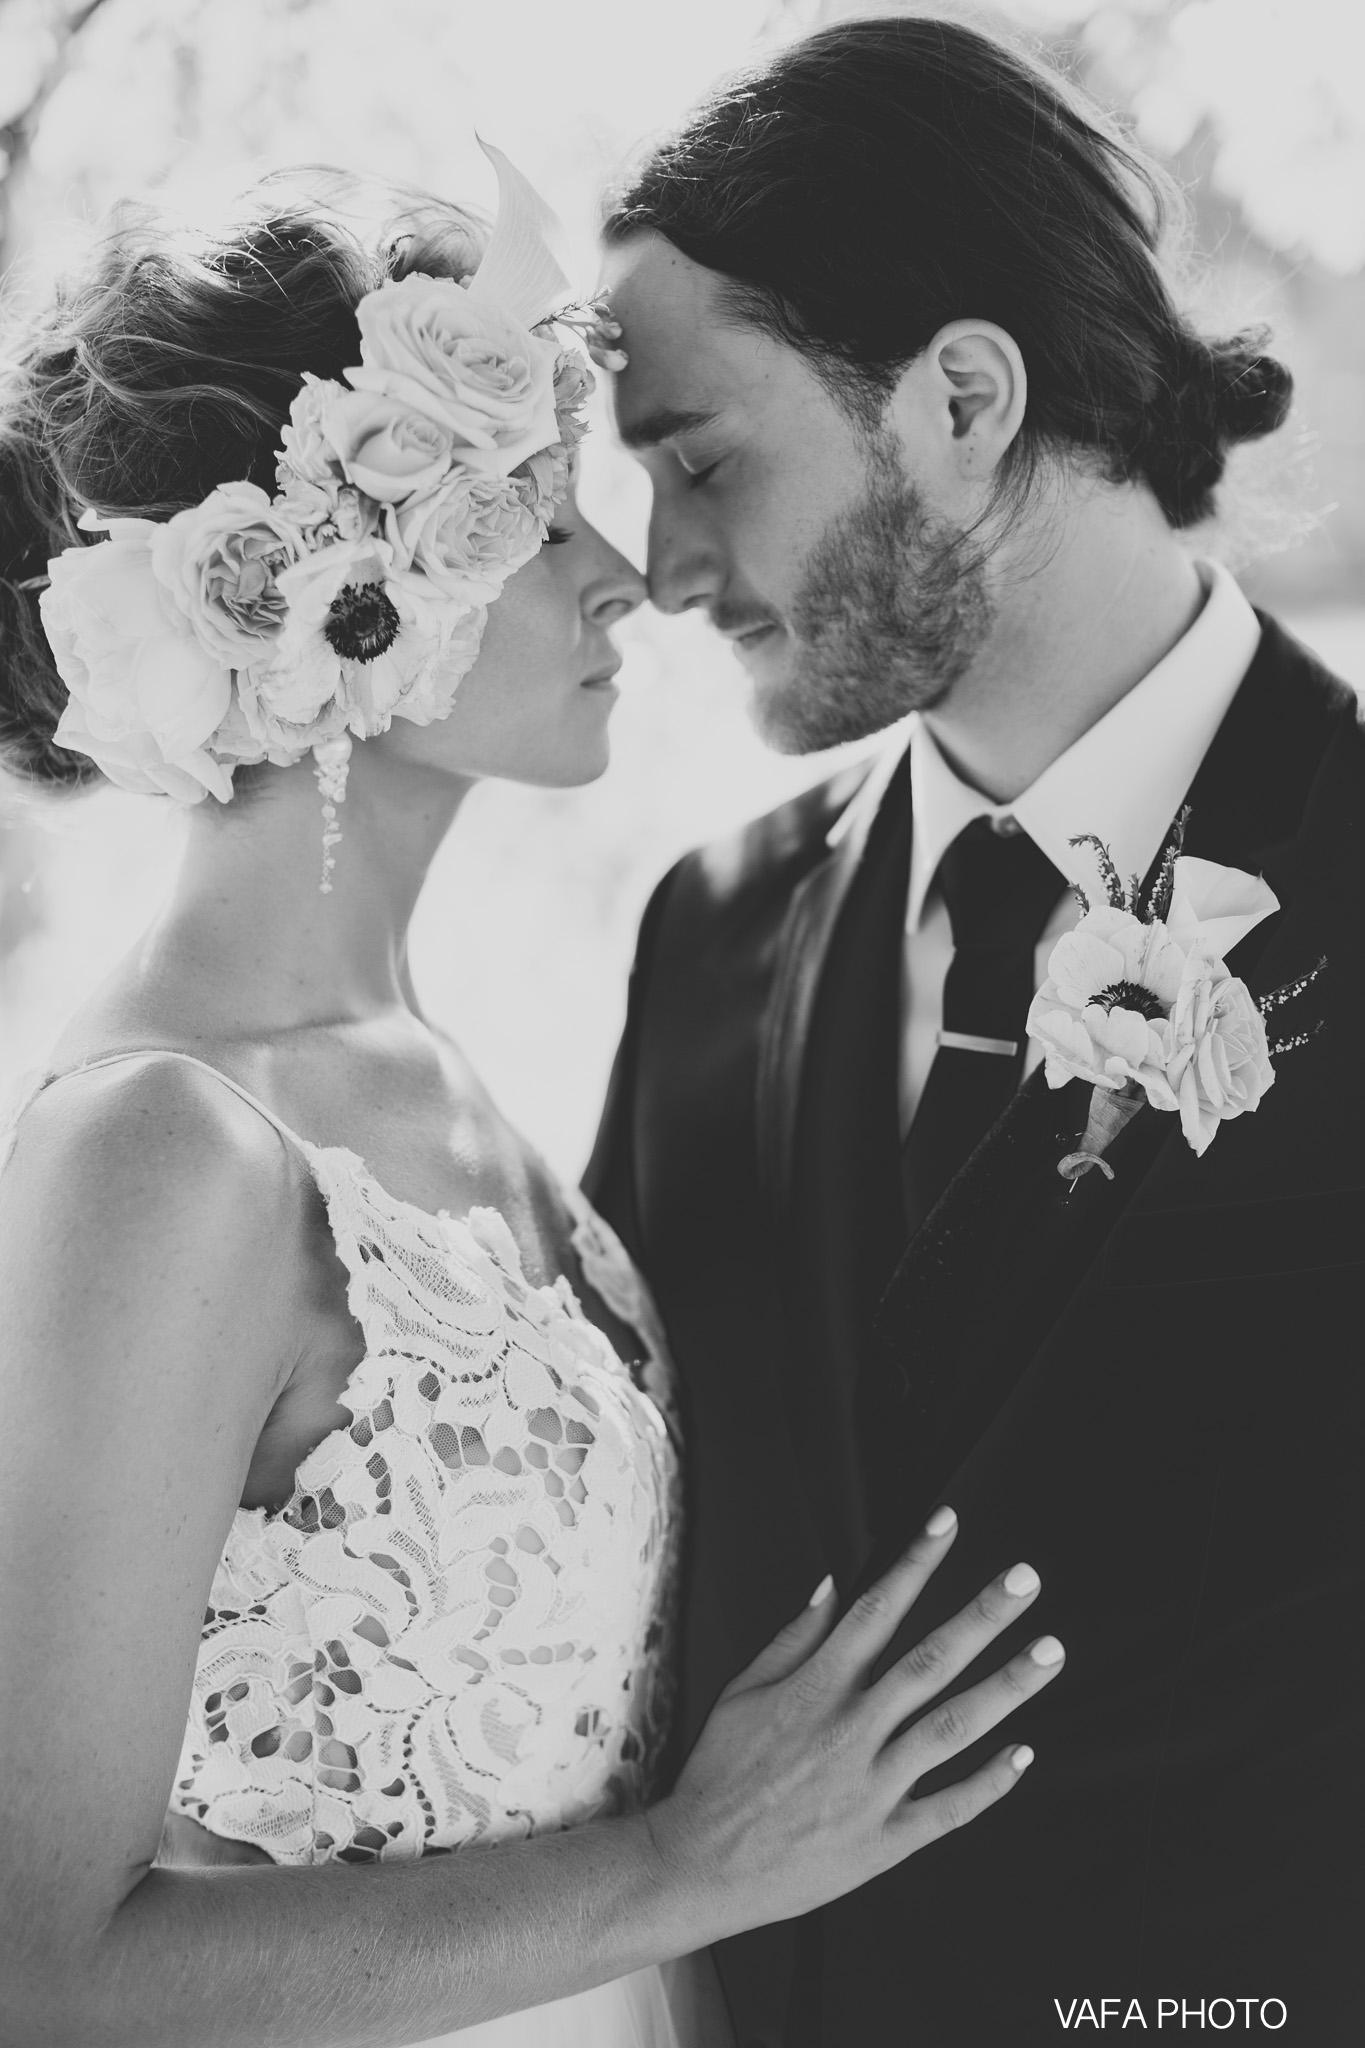 The-Felt-Estate-Wedding-Kailie-David-Vafa-Photo-573.jpg